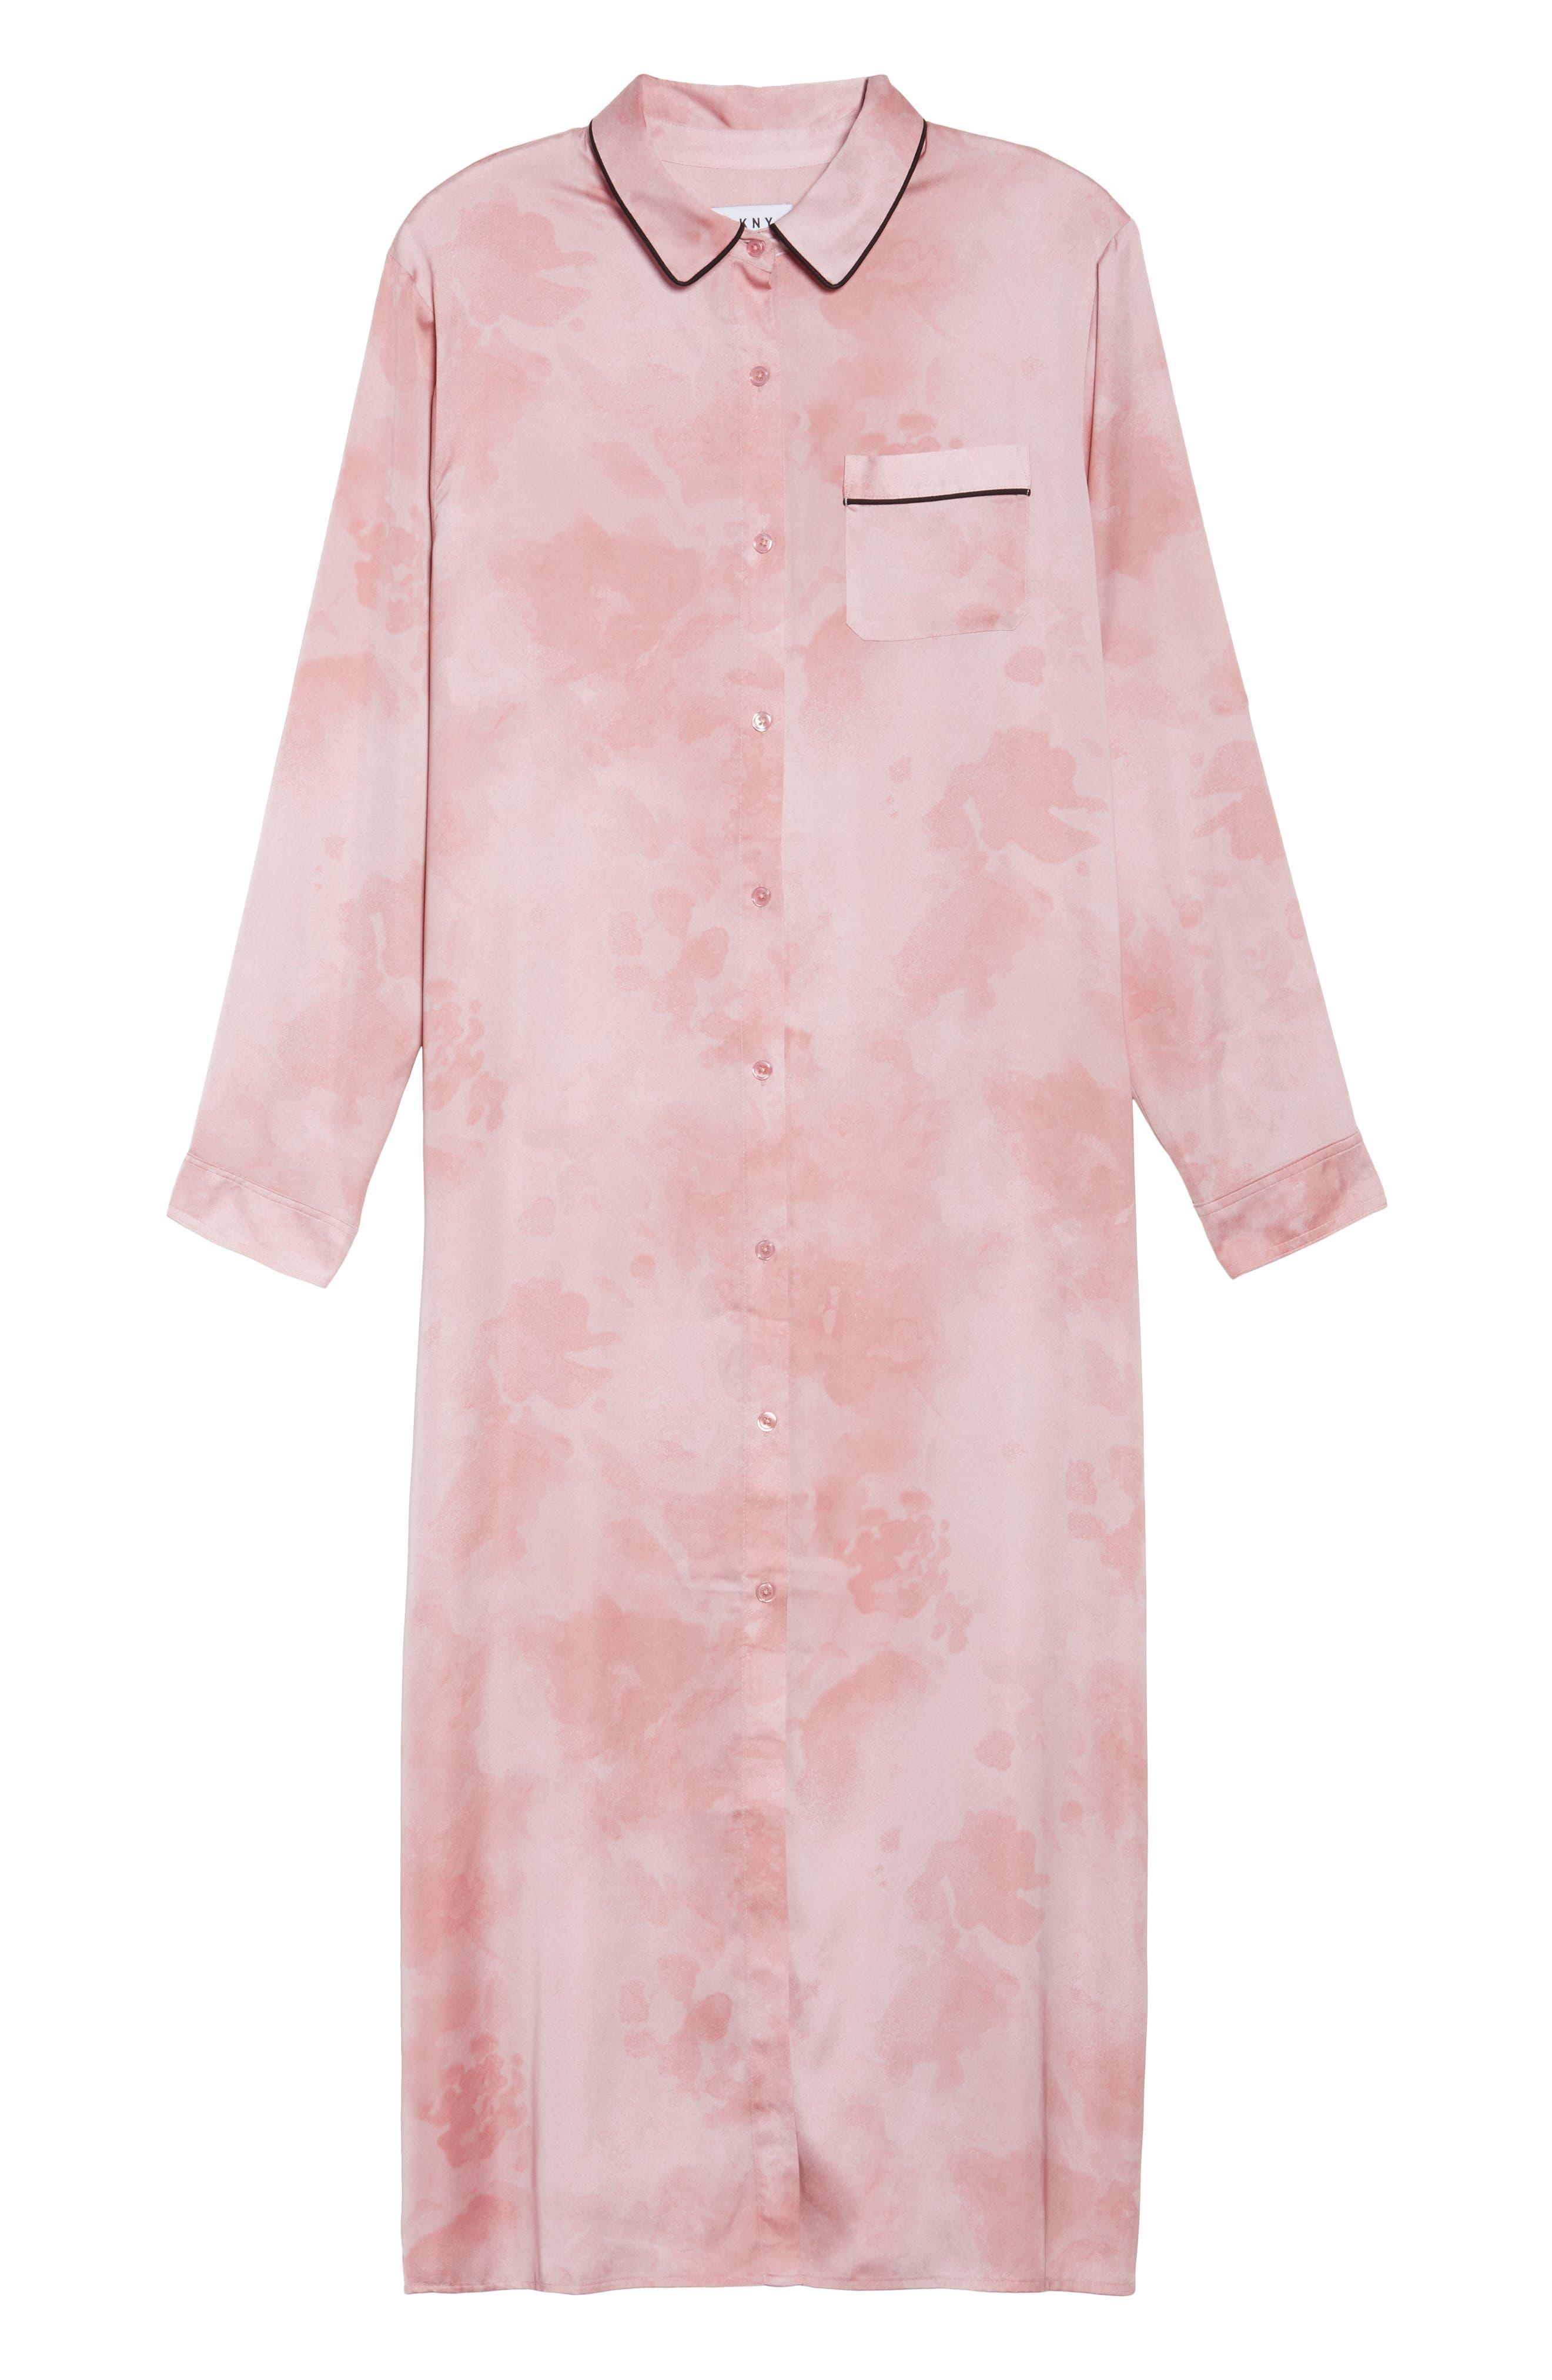 Washed Satin Maxi Sleep Shirt,                             Alternate thumbnail 6, color,                             Pink Floral